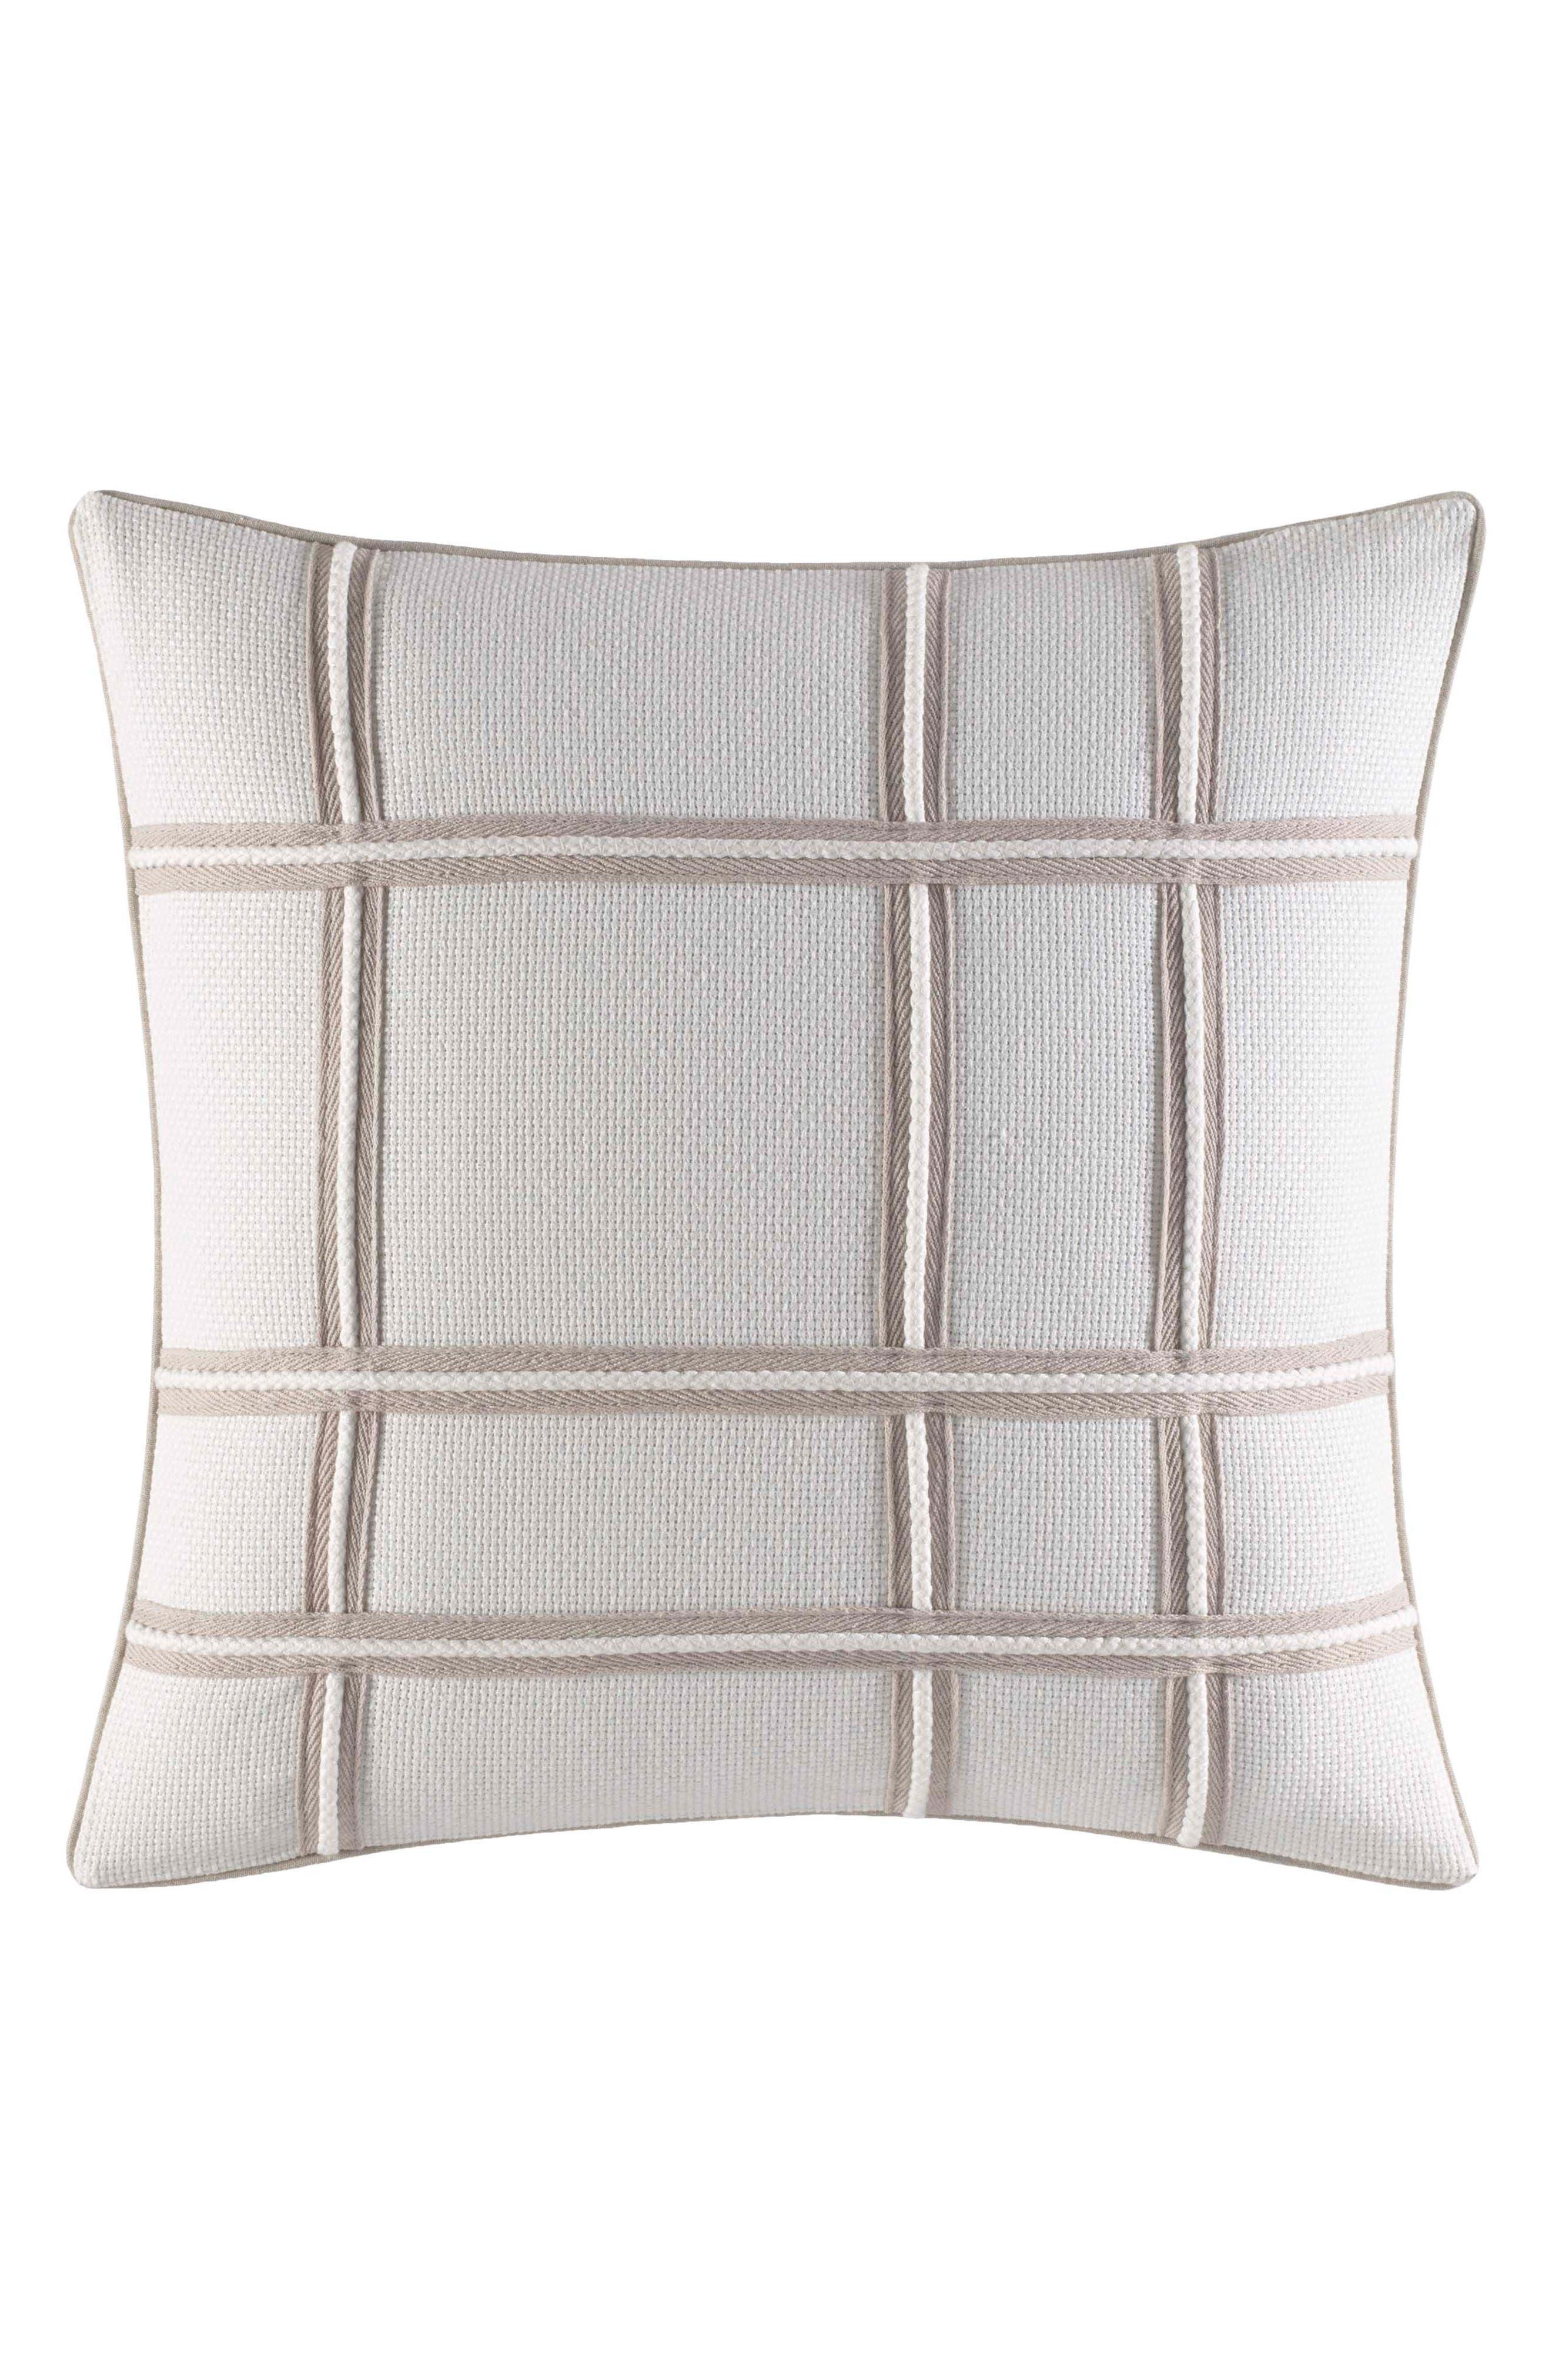 Abbot Rope Appliqué Accent Pillow,                         Main,                         color, White